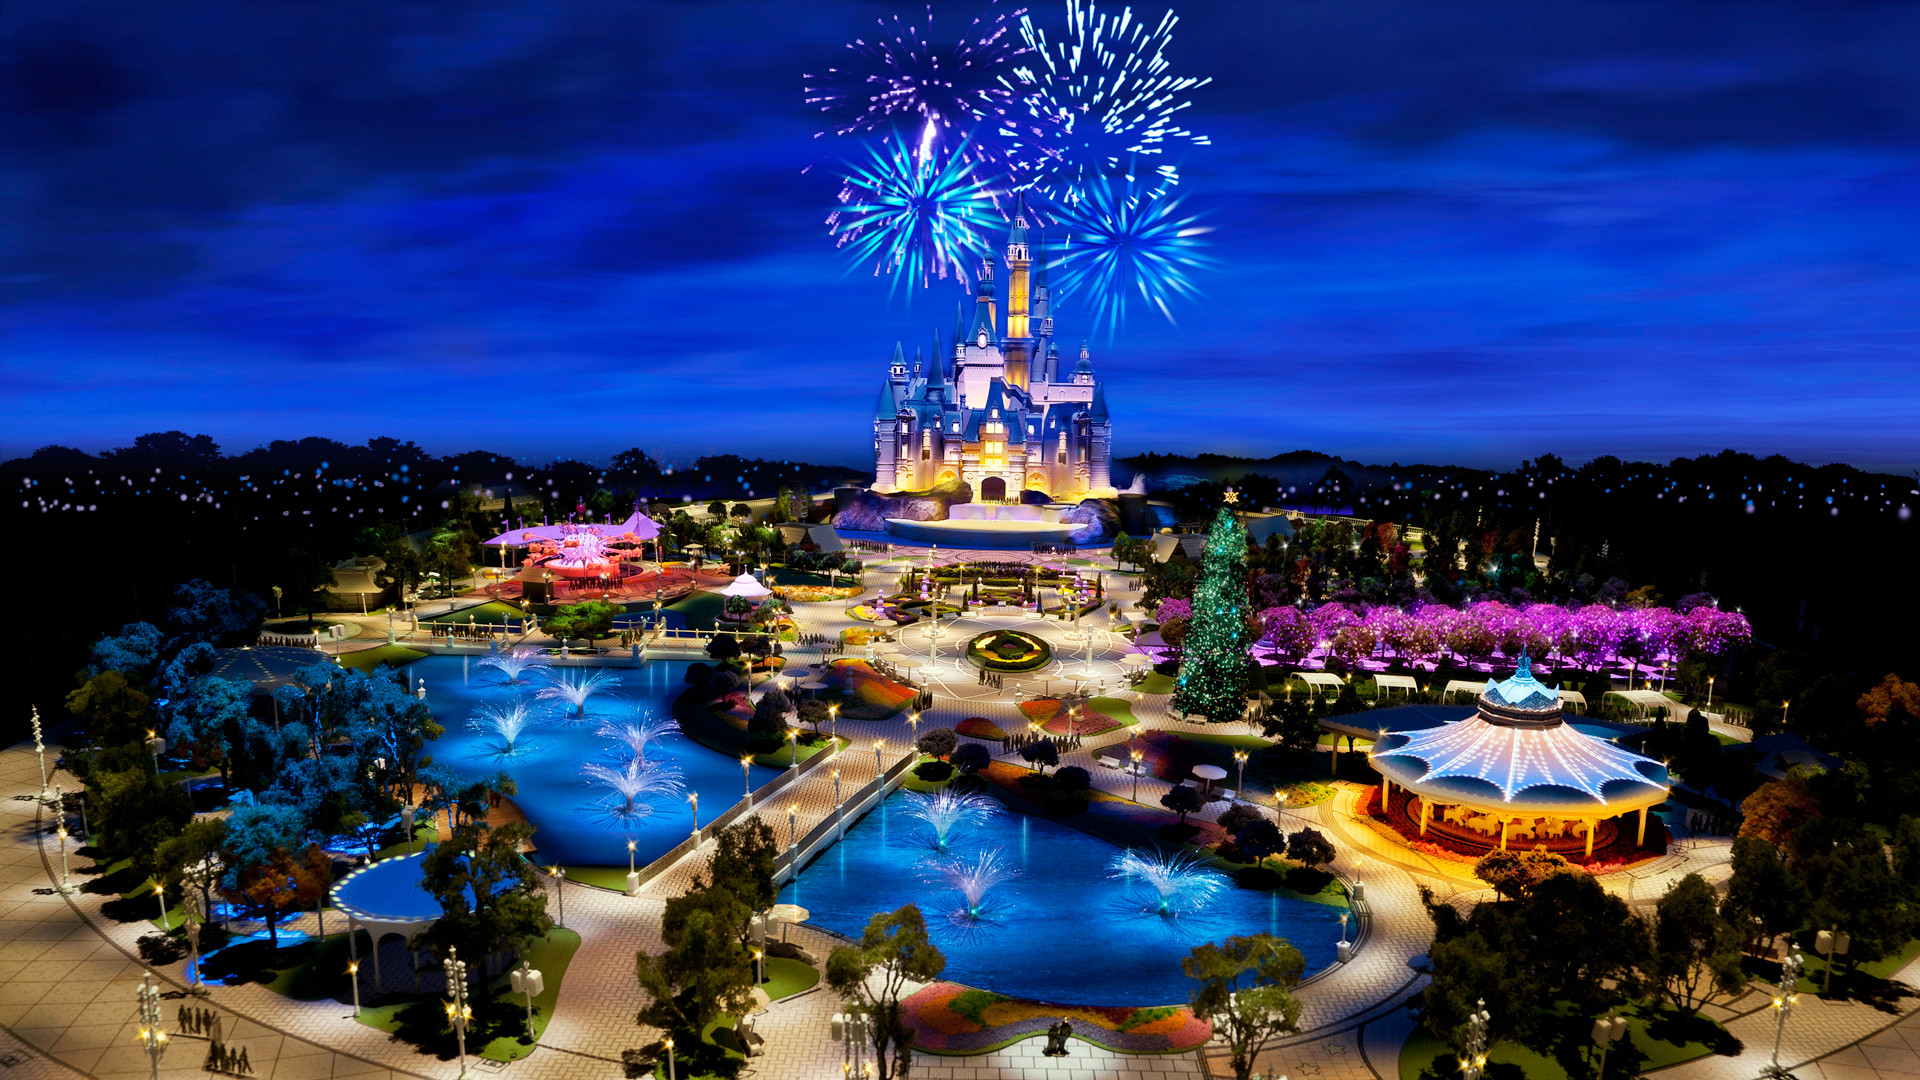 Disney Parks Wallpaper HD For Desktop.